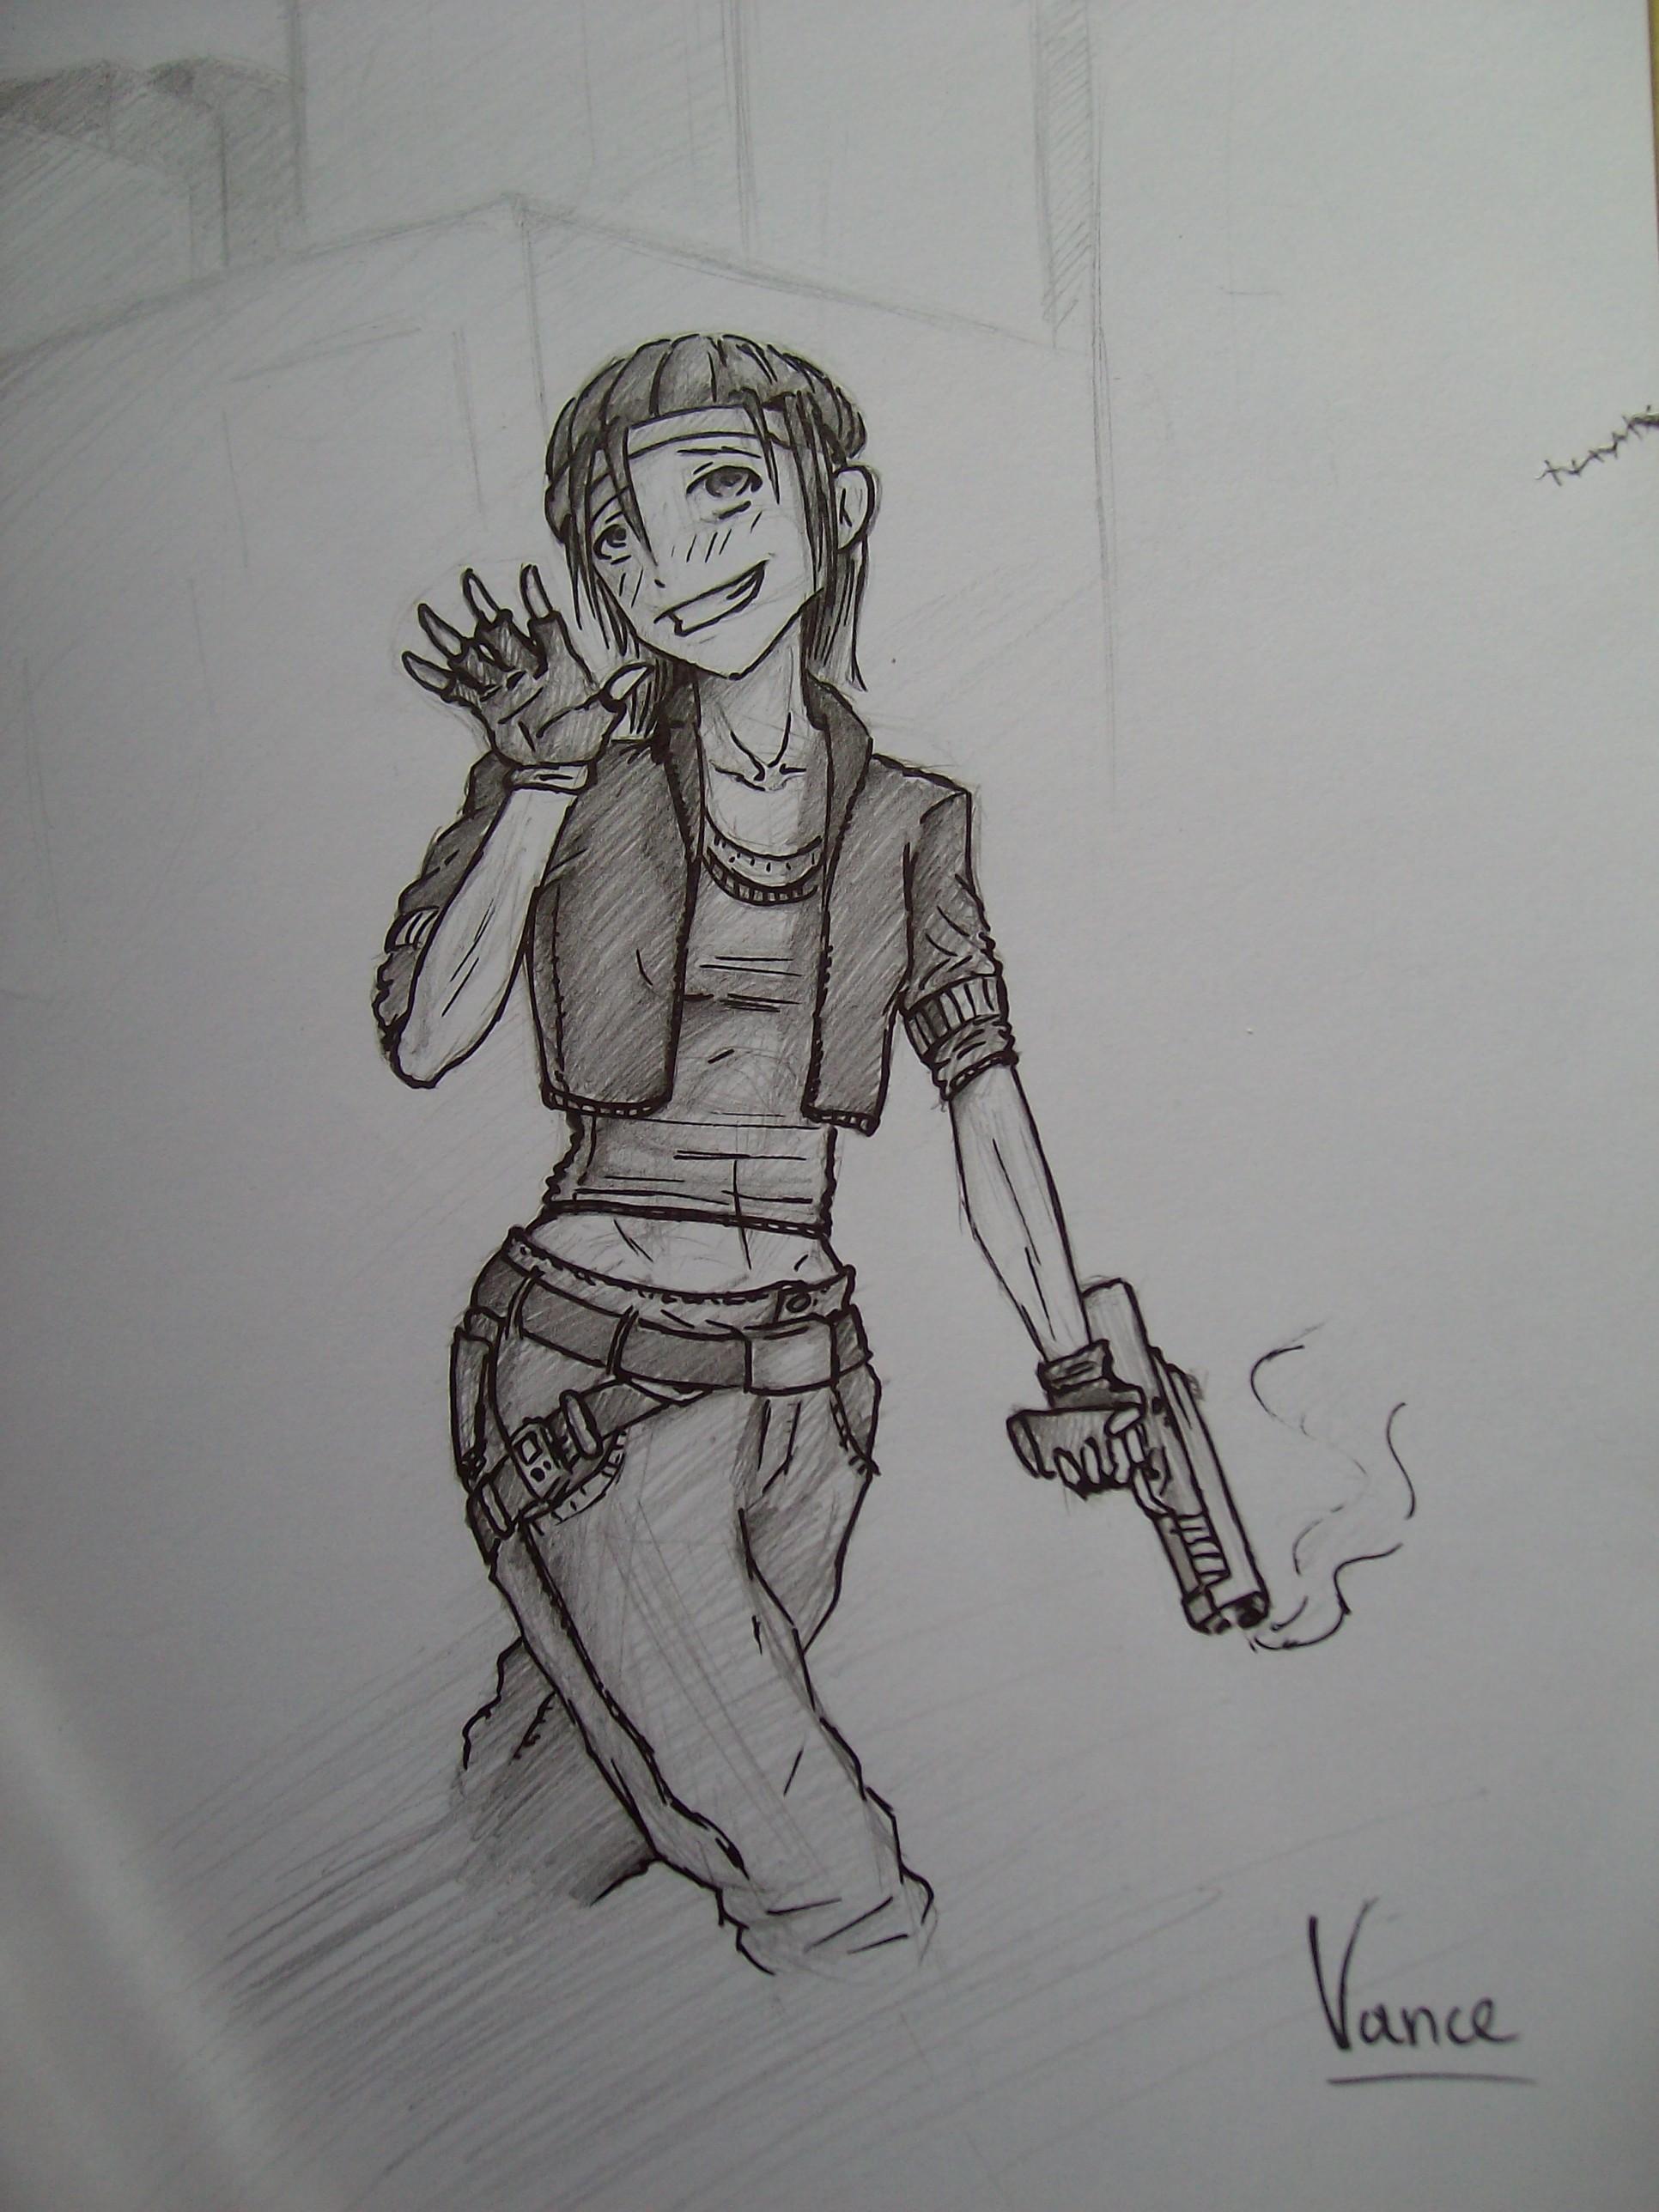 Sketch - Vance